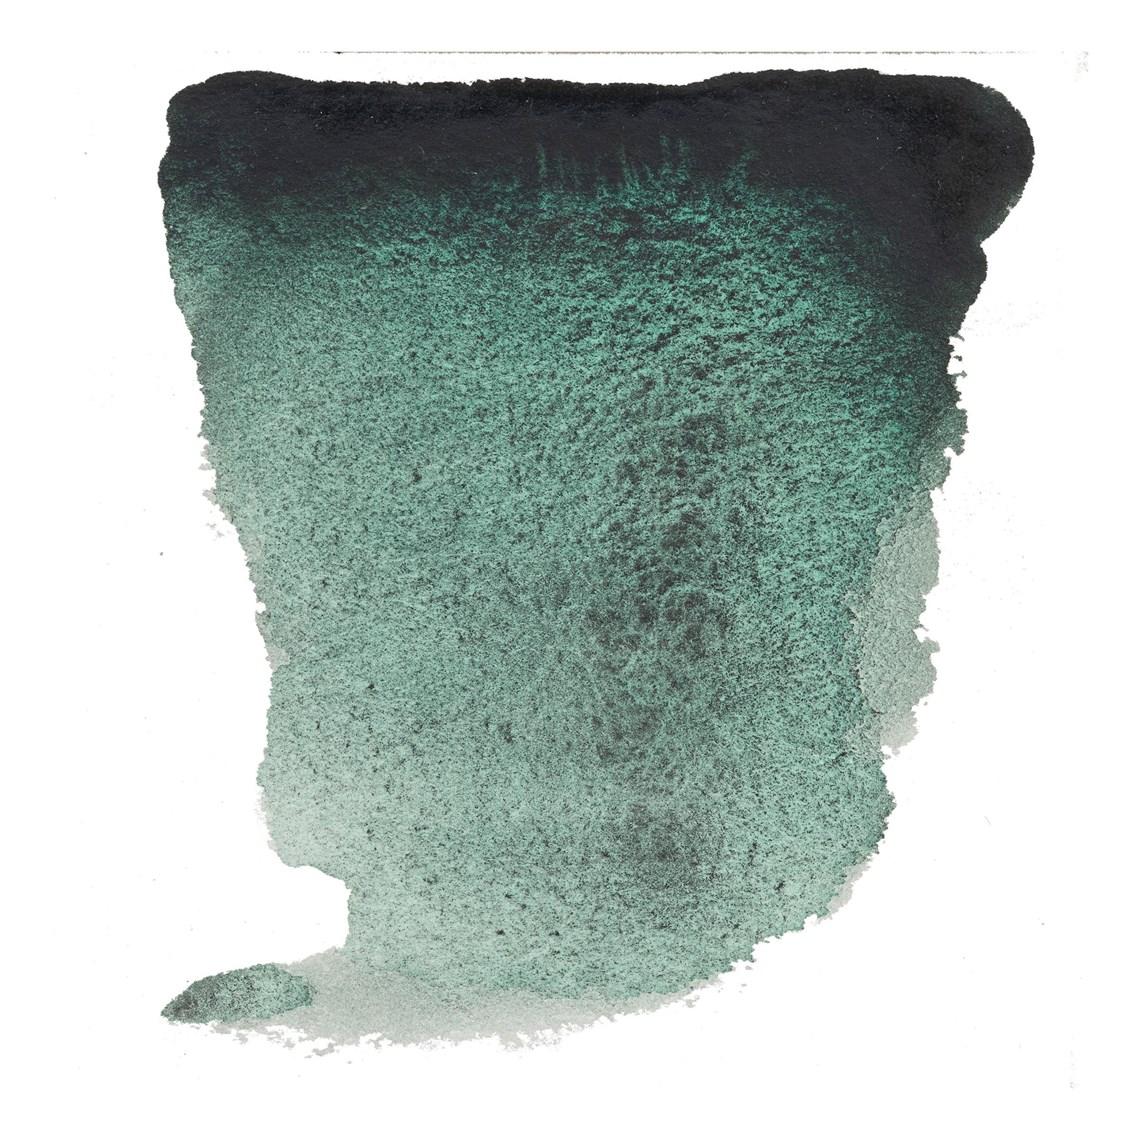 Aquarelverf Schemering groen 630 tube 10 ml. Van Gogh